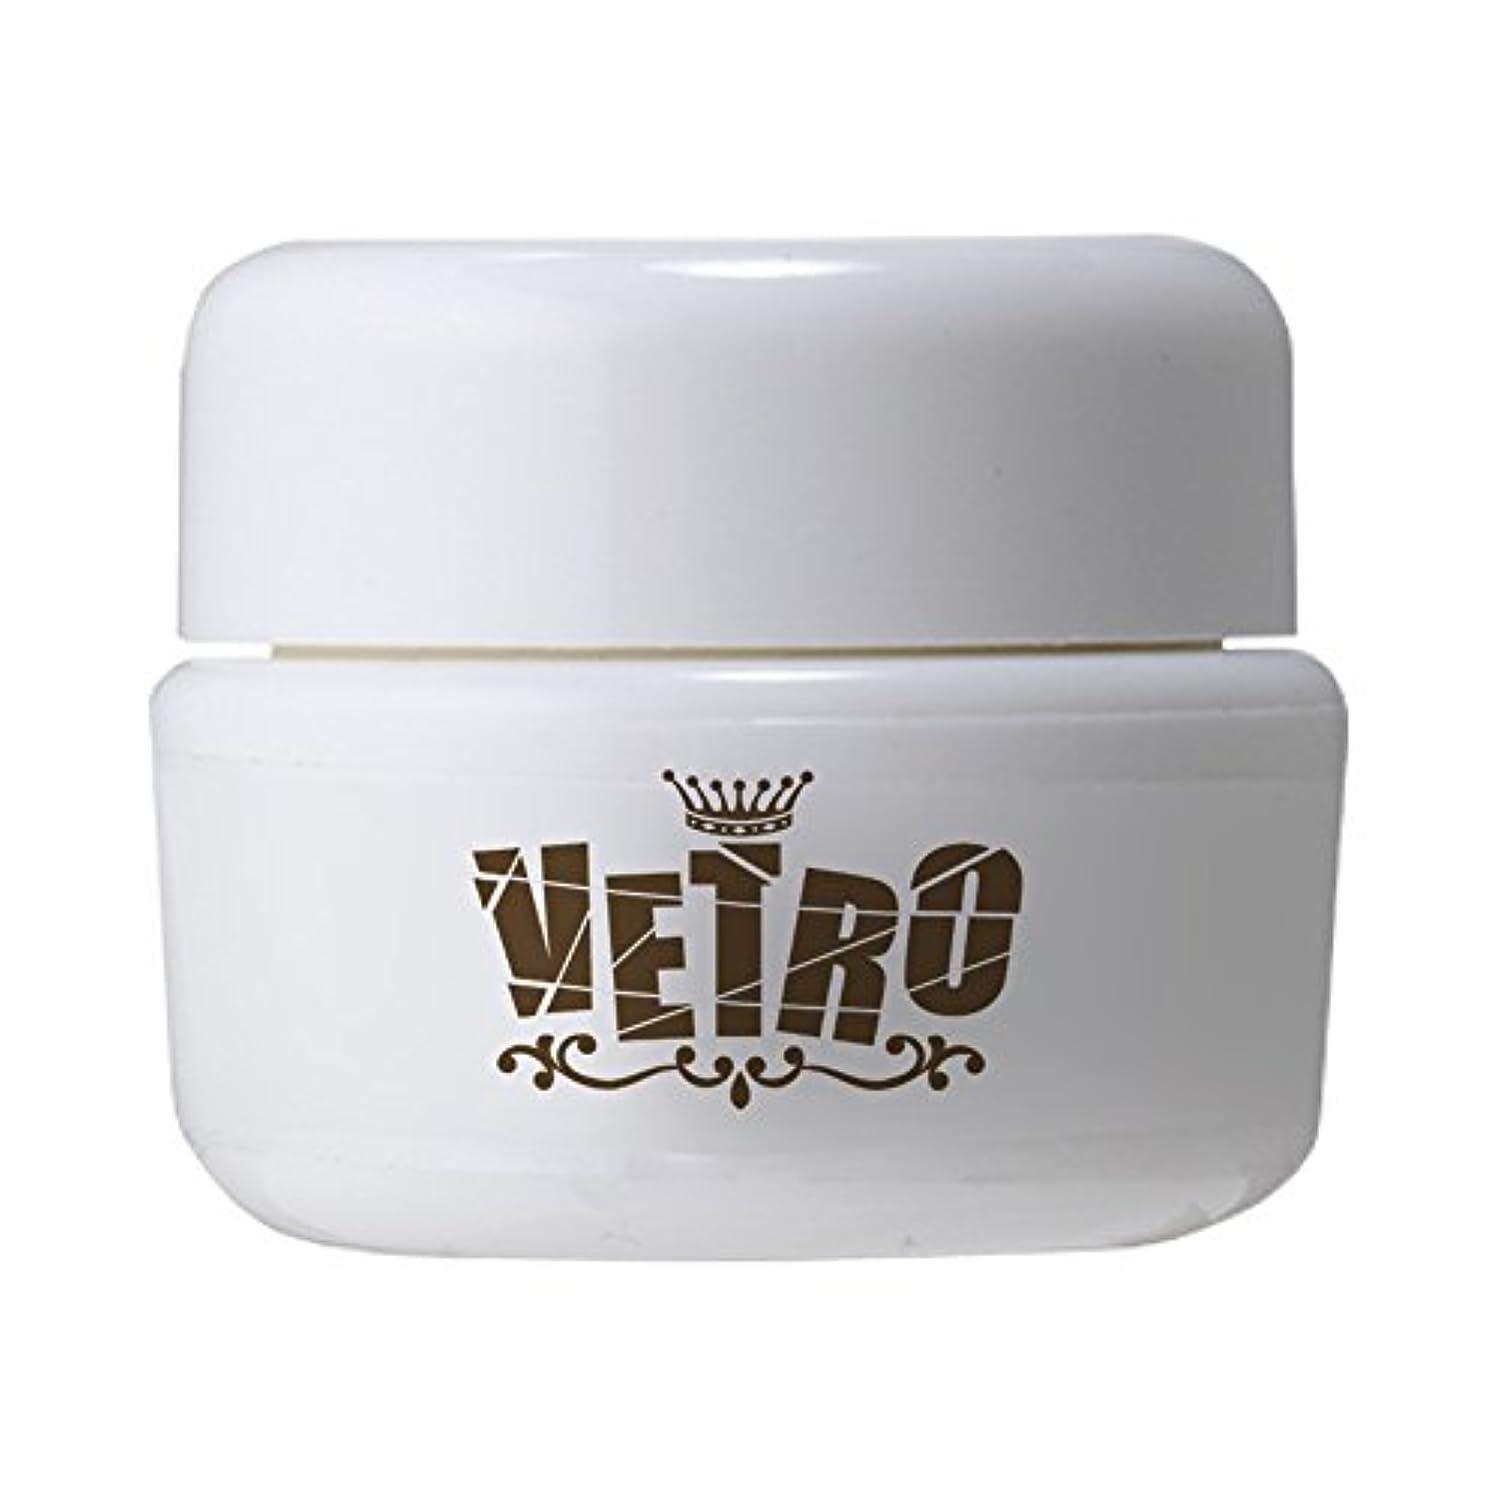 VETRO No.19 カラージェル マット VL002 シャクヤク 4ml